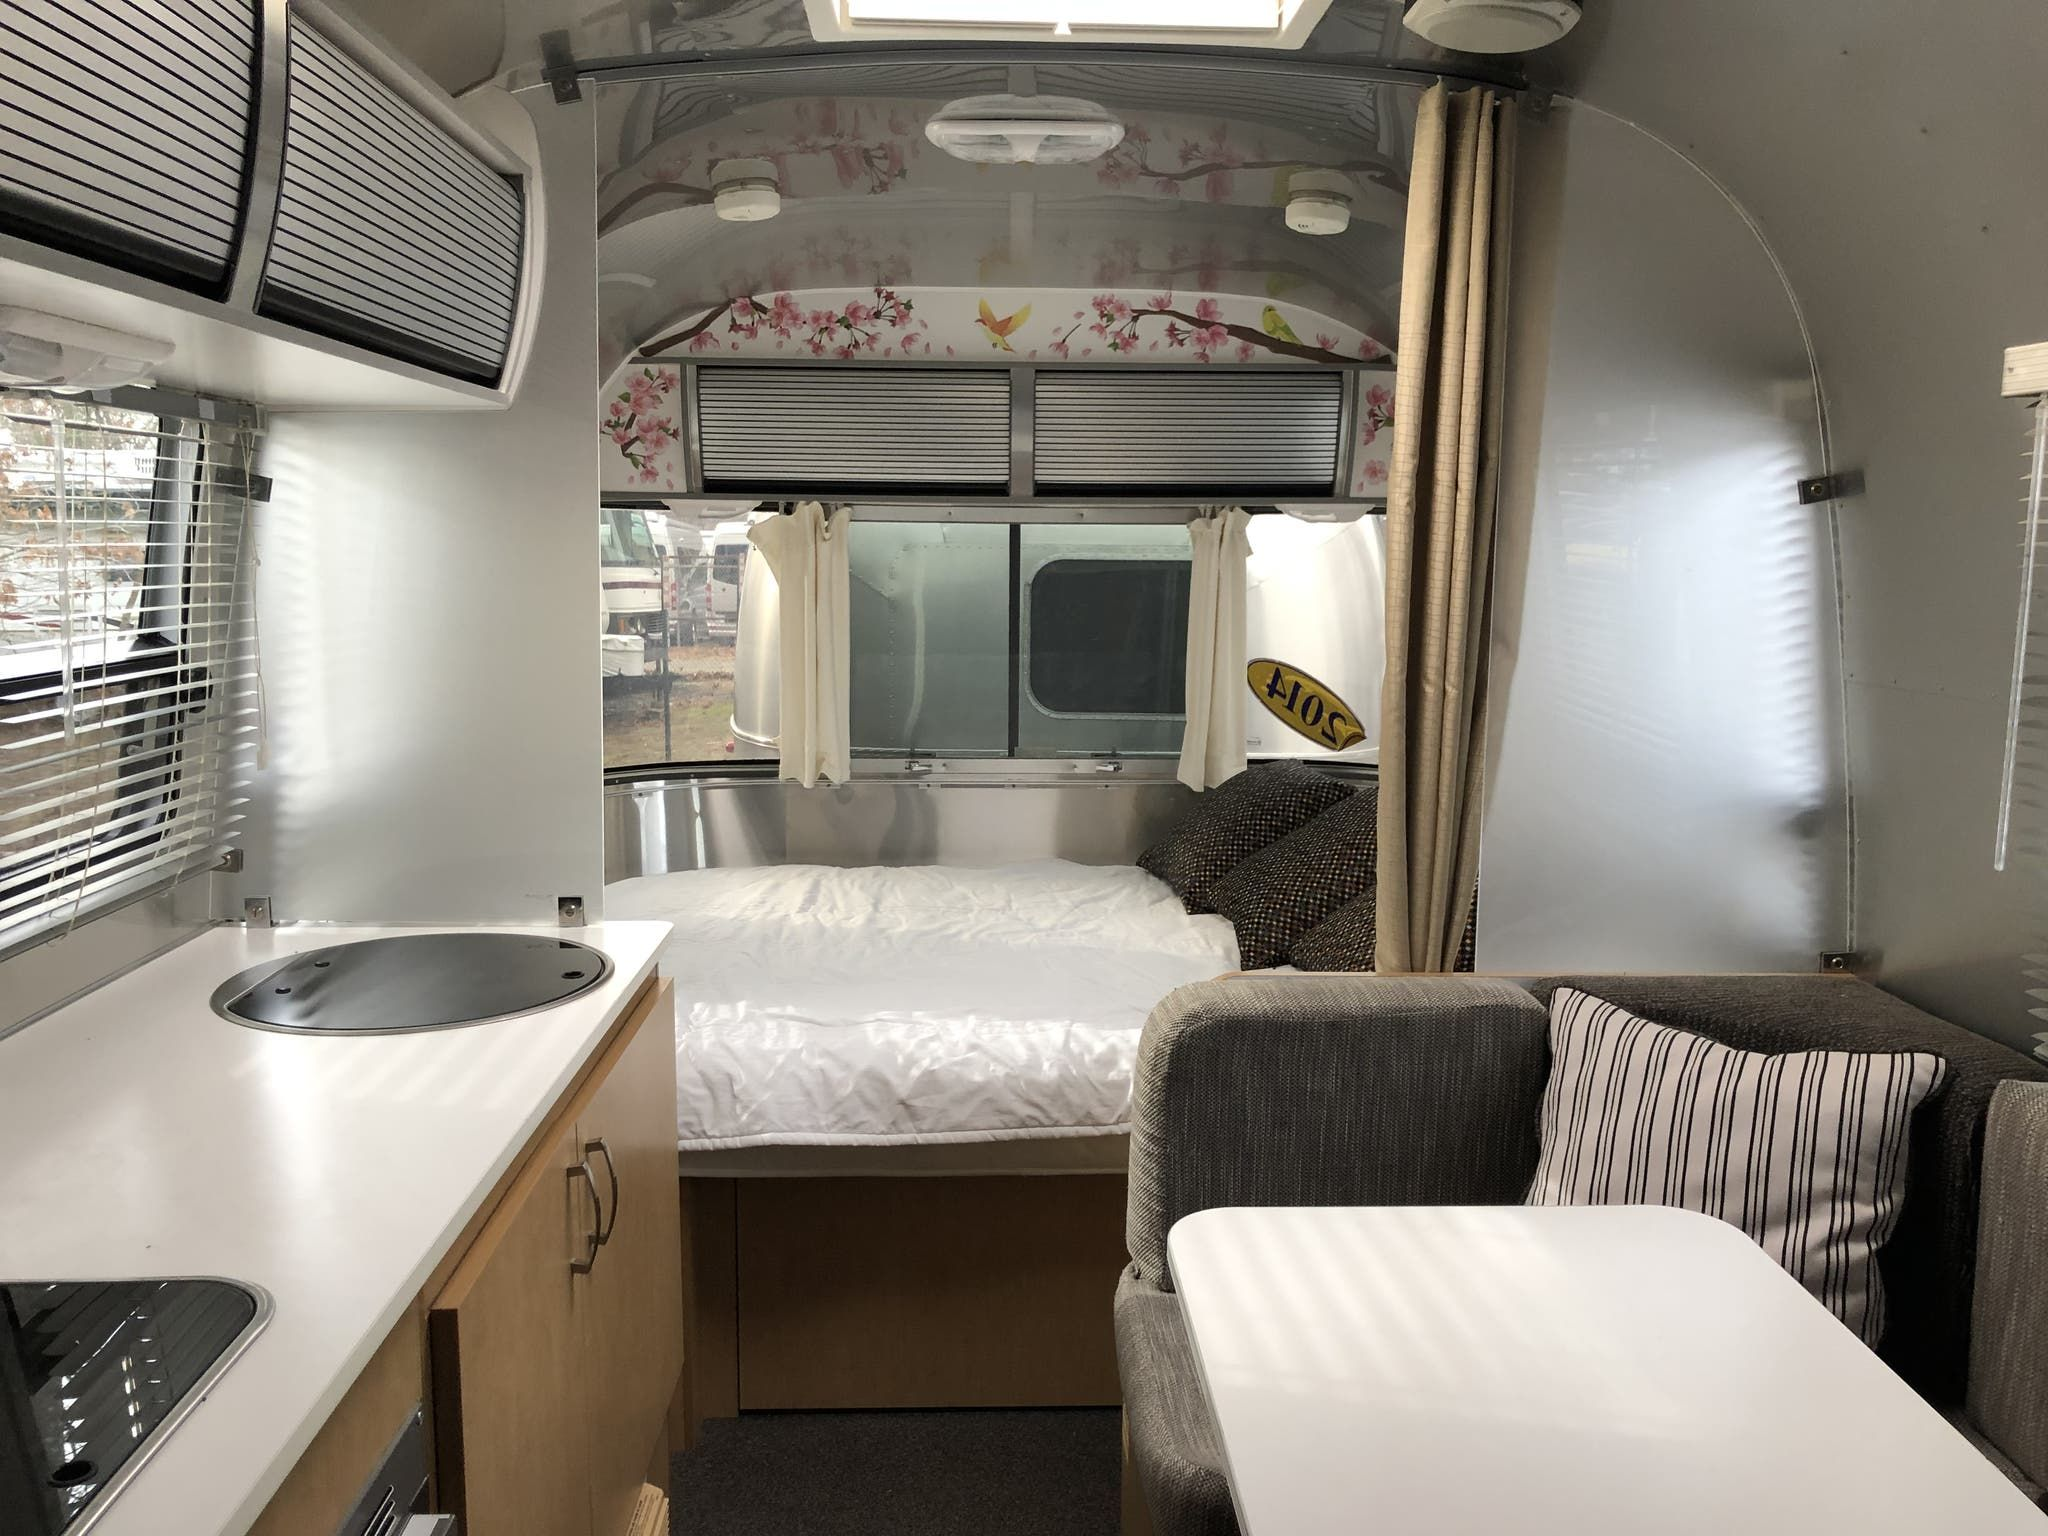 2014 Airstream Sport 22fb Bambi Airstream Under Bed Storage